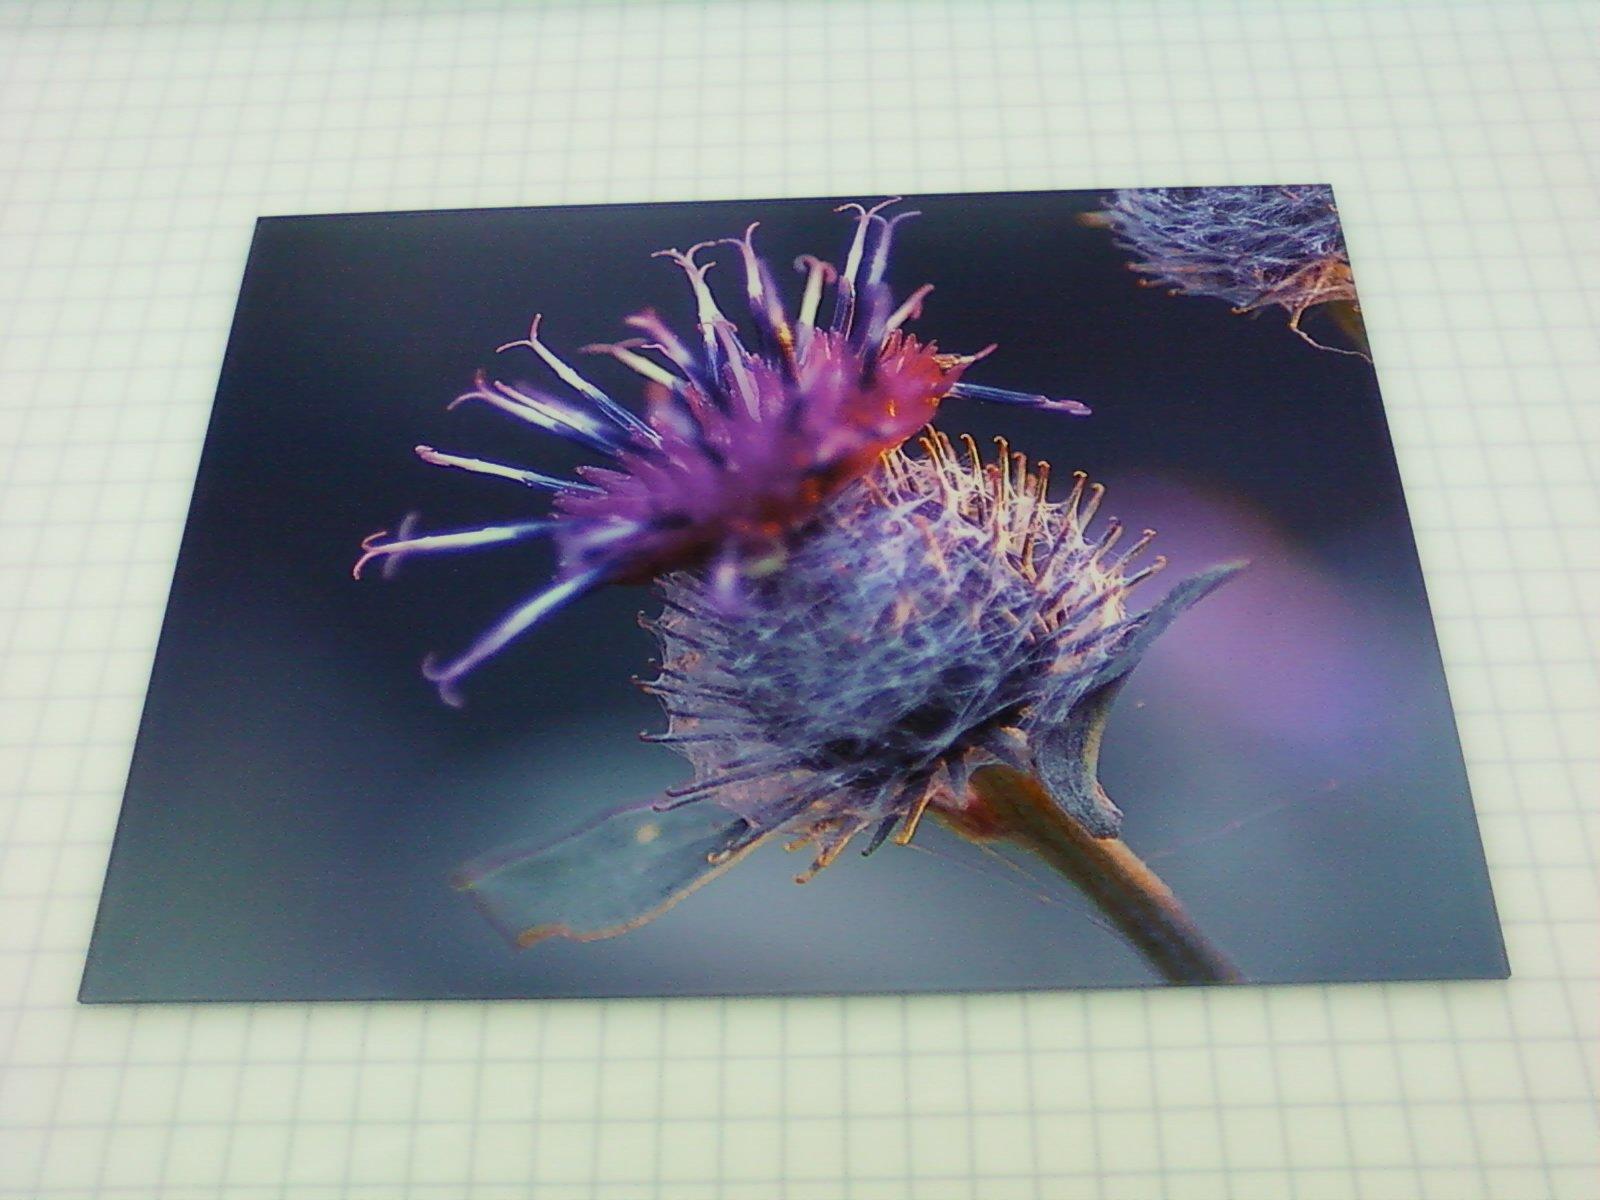 Acrylic Photo Frames & Prints | Executive Printers of Florida